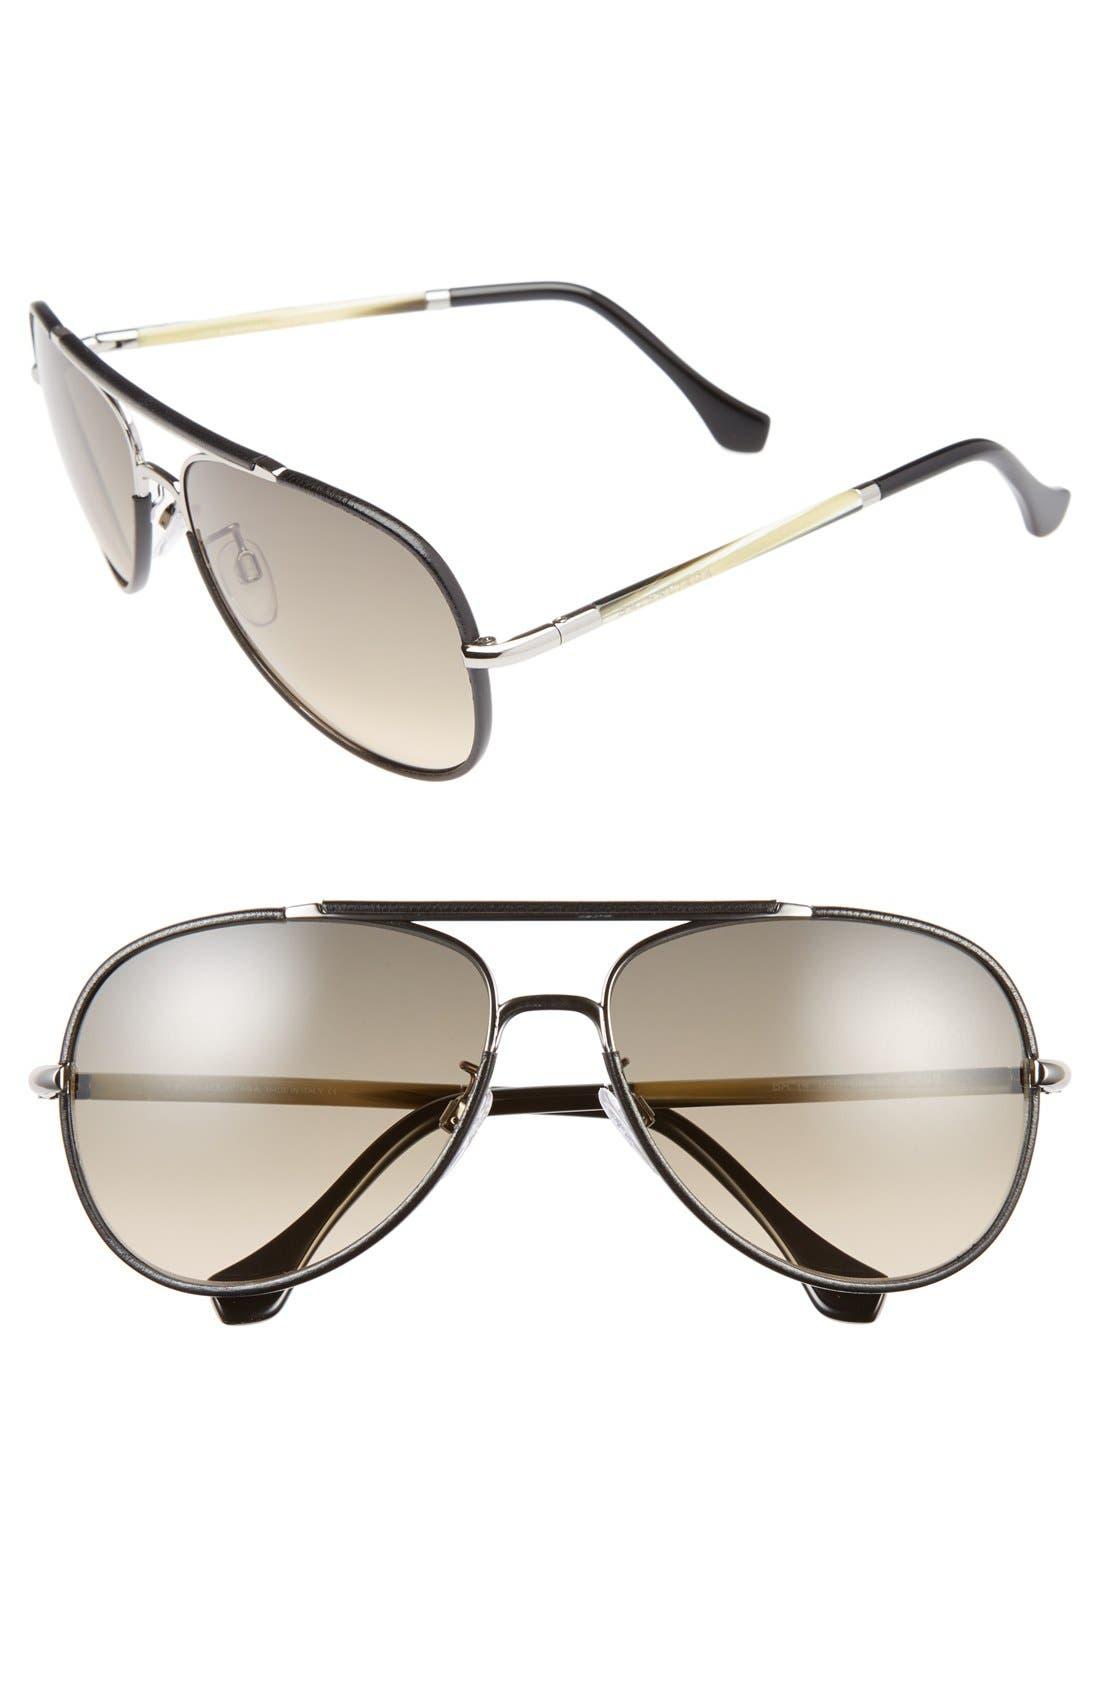 Alternate Image 1 Selected - Balenciaga Paris 60mm Sunglasses